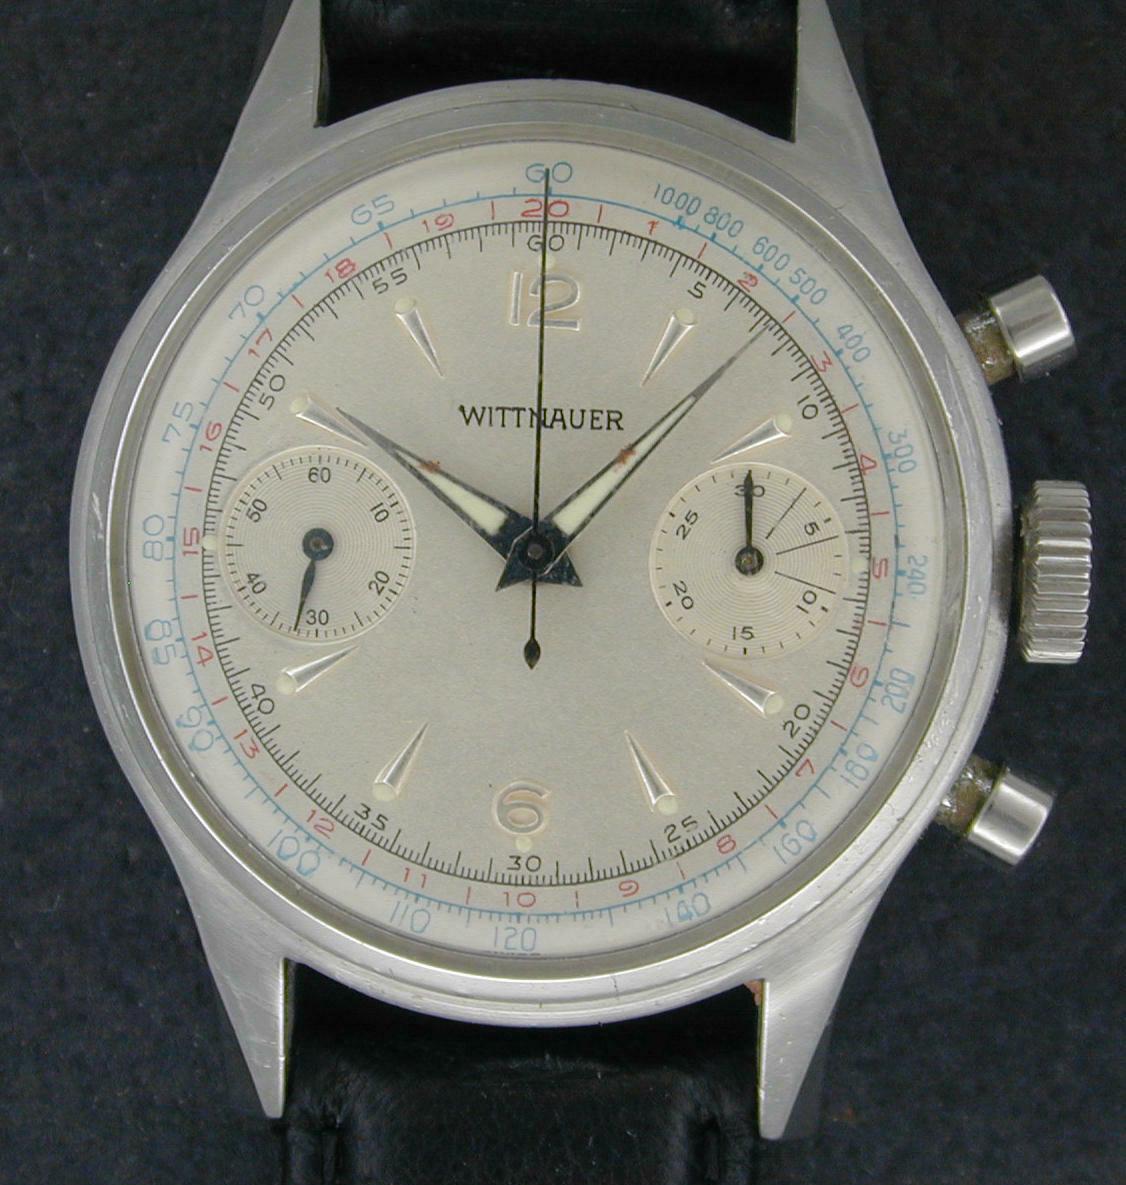 Wittnauer Chronograph #201129